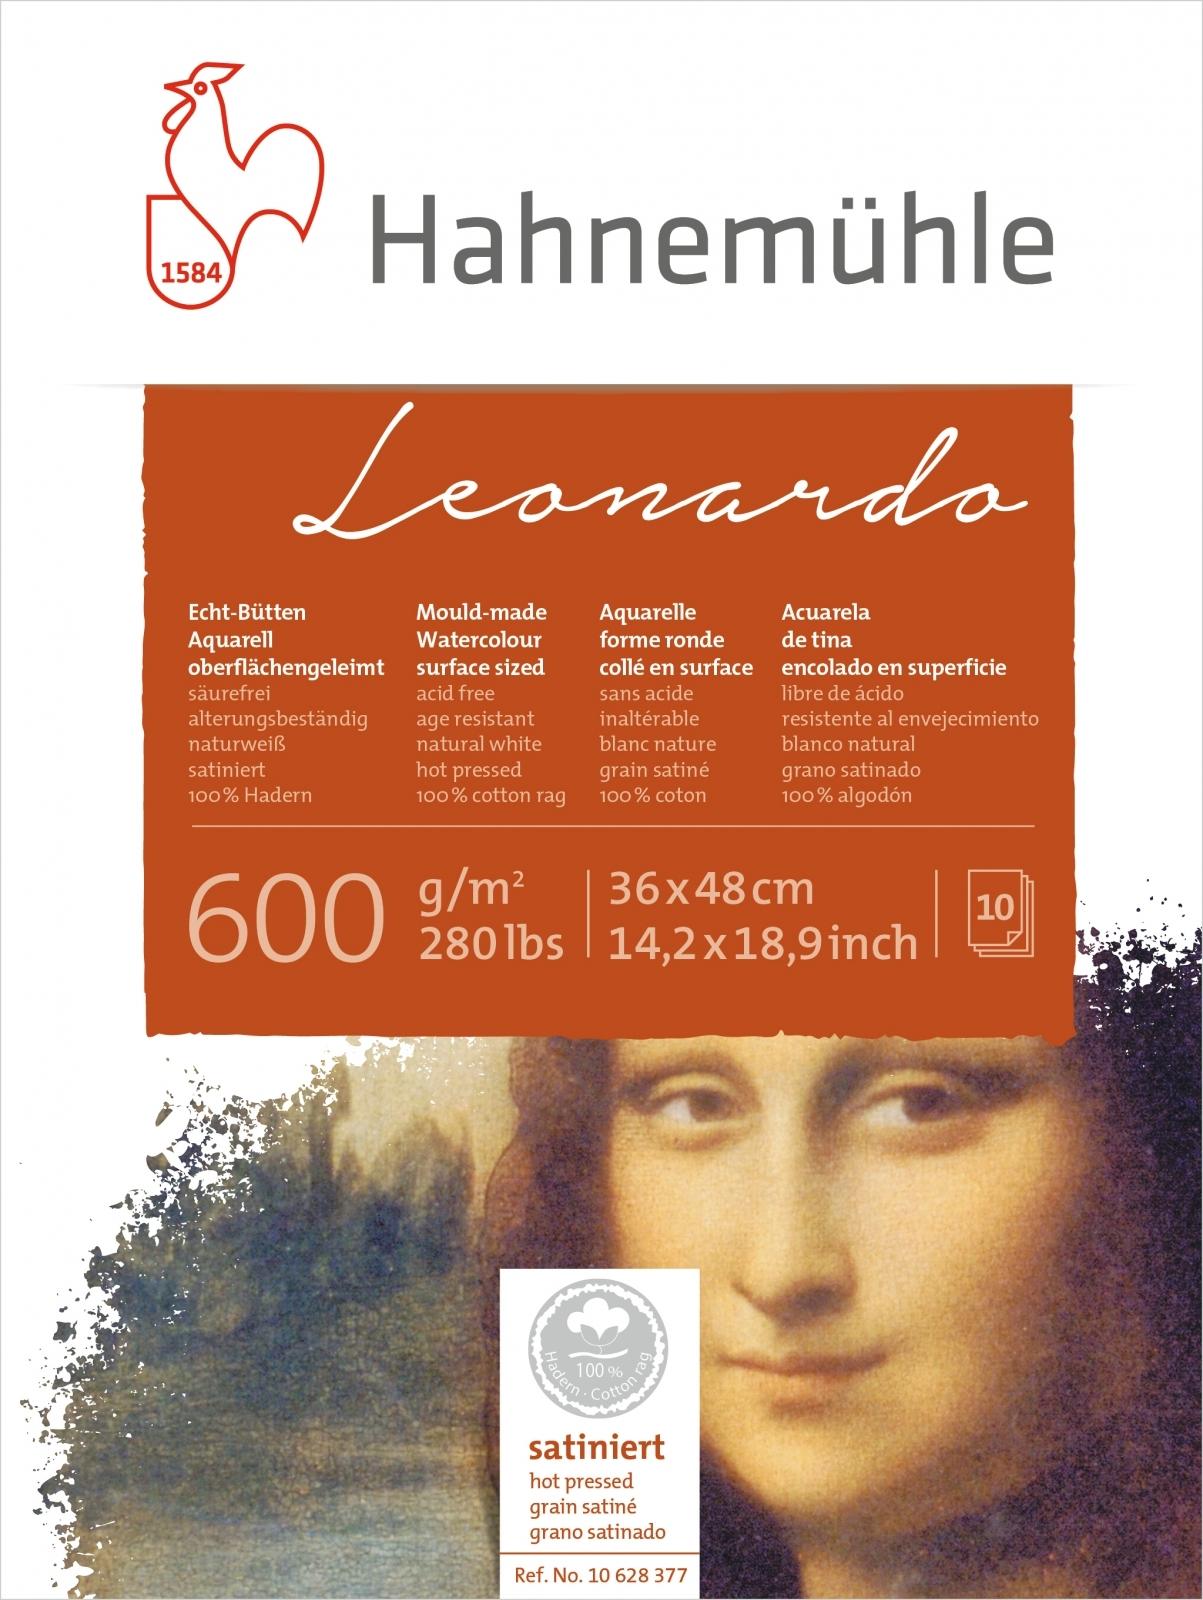 Papel Hahnemuhle Leonardo Textura Satinada 600g/m2 36x48 10f - Papelaria Botafogo